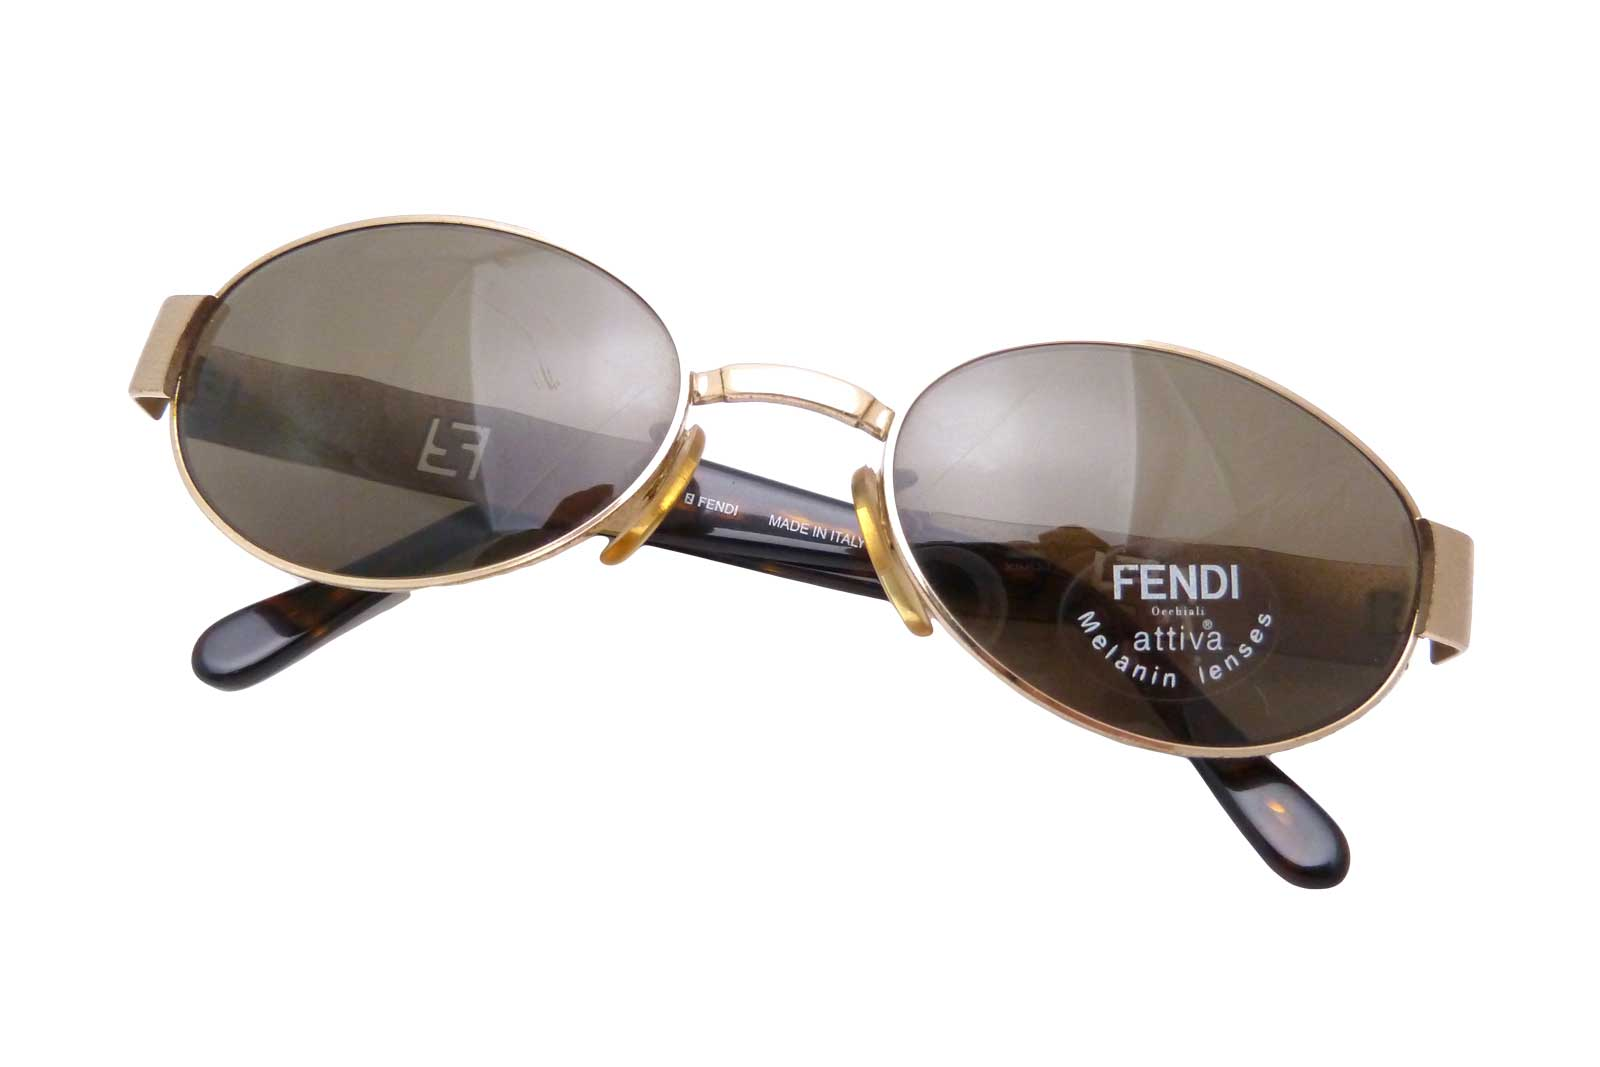 c5335bdb7c1 Auth FENDI Logos Brown Sunglasses Goldtone Worn-out  - e15562